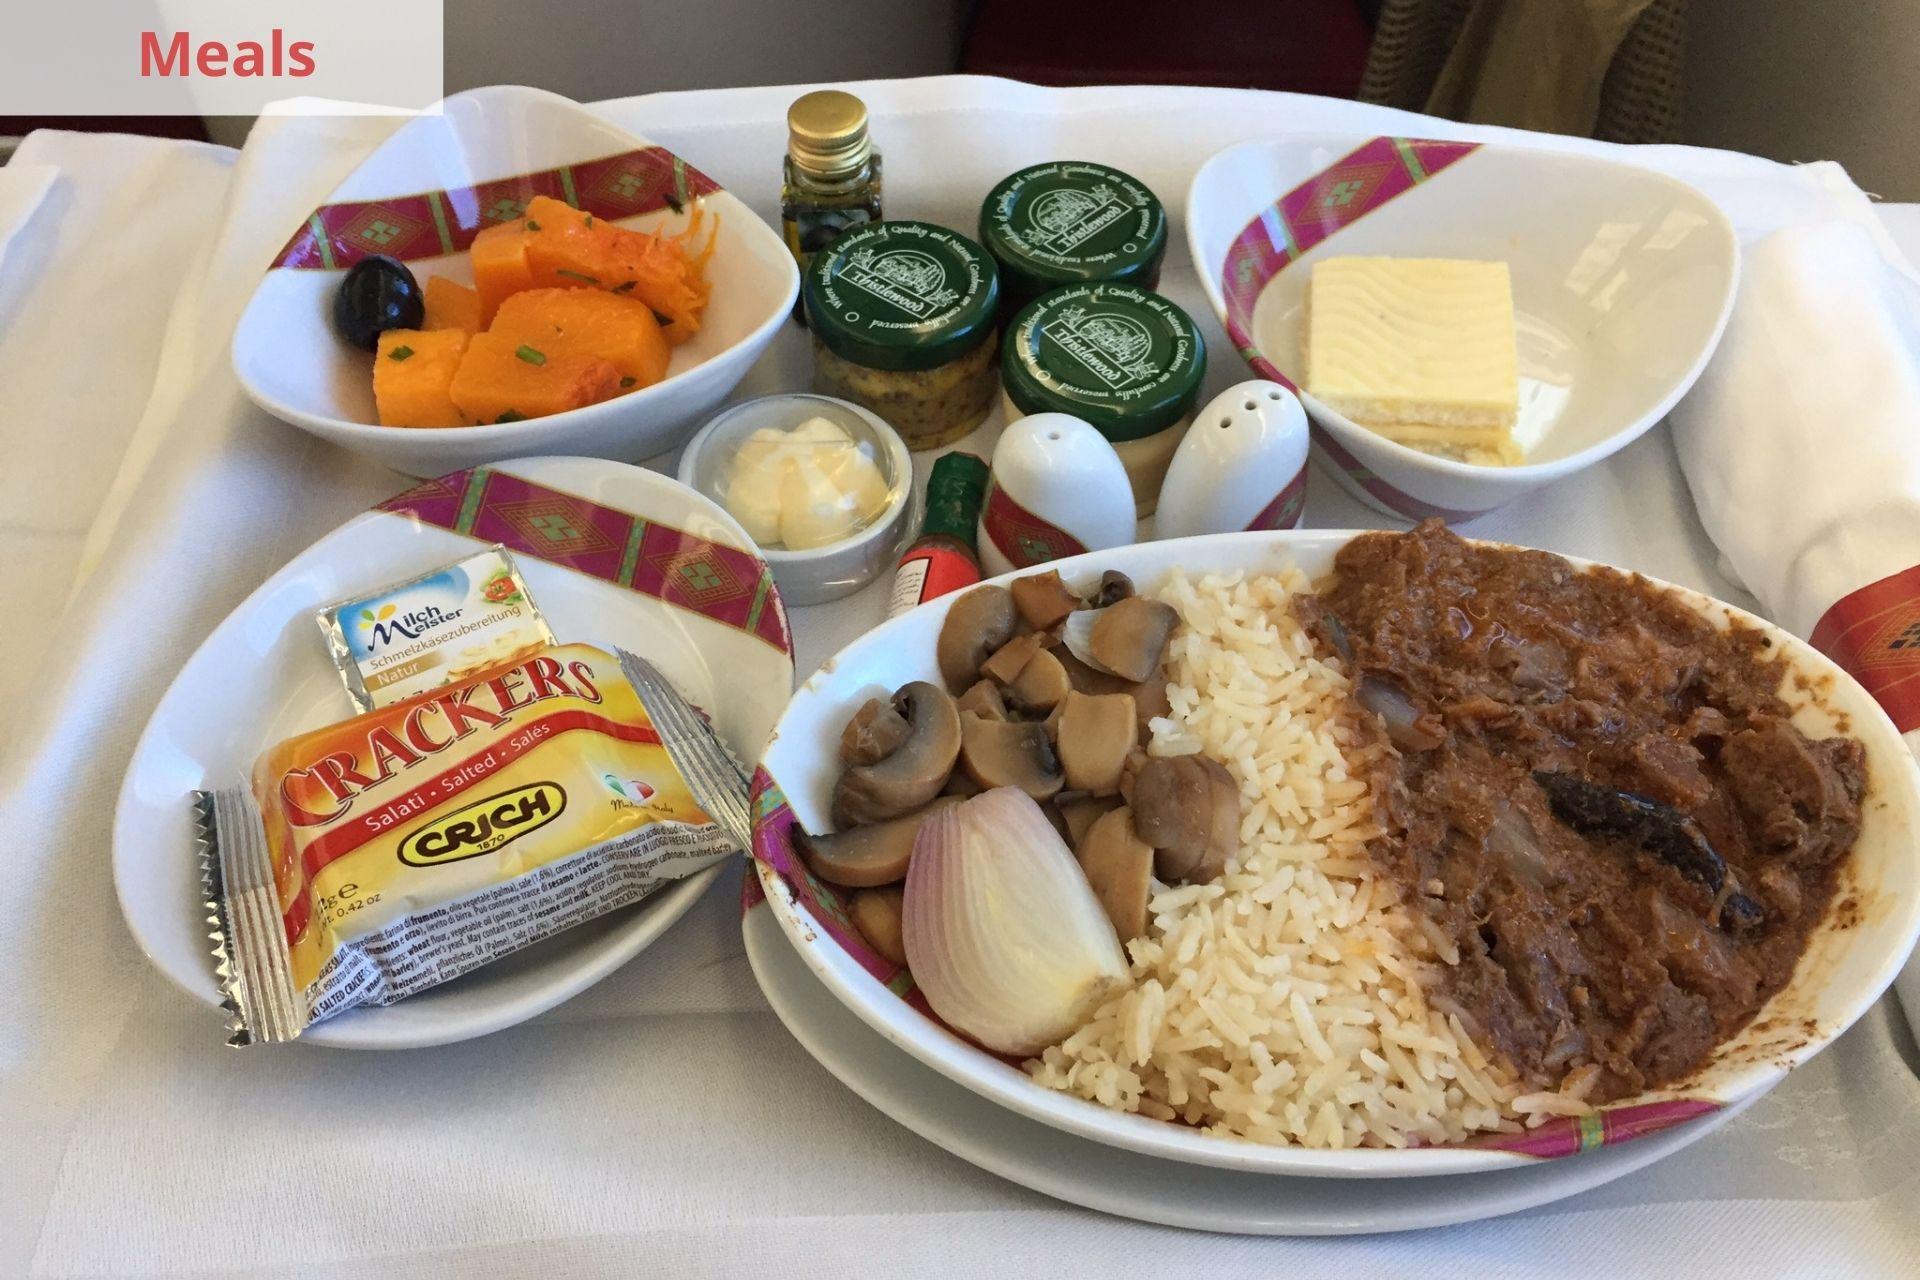 Ethiopian Airlines Meals